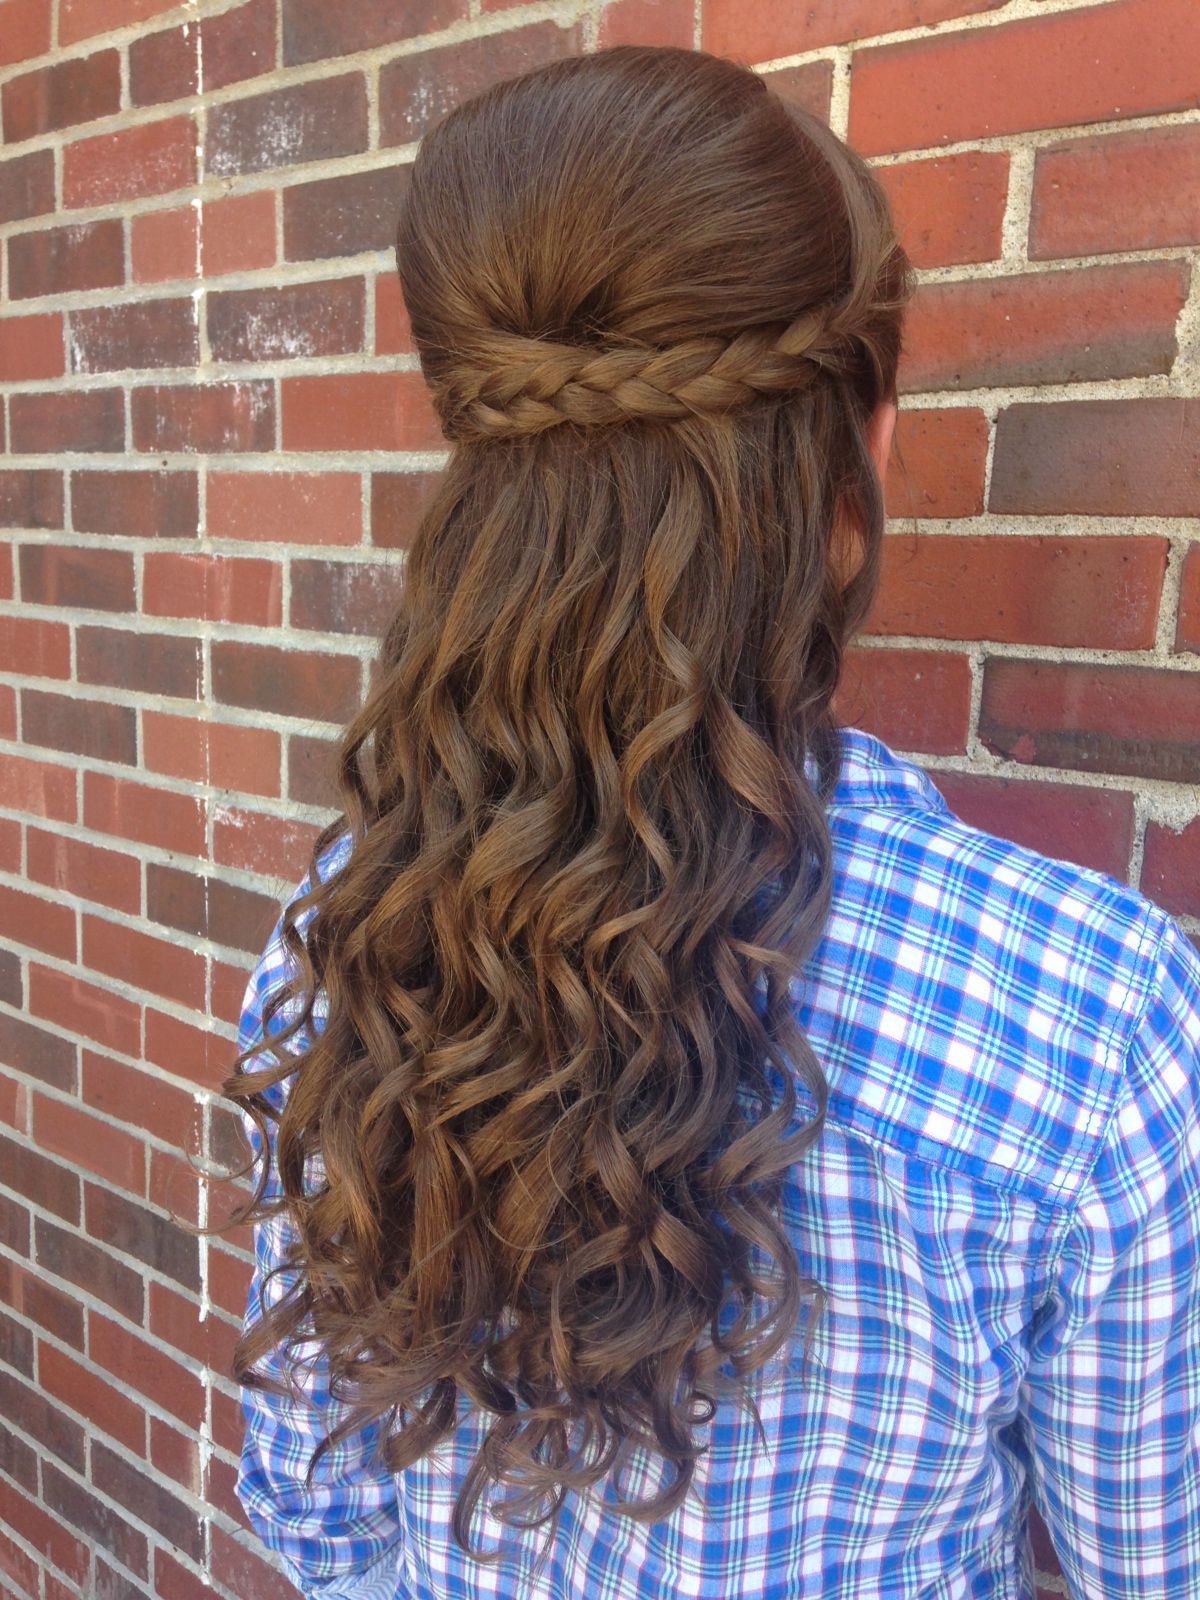 prom hair * half up half down * curly braided bump romantic